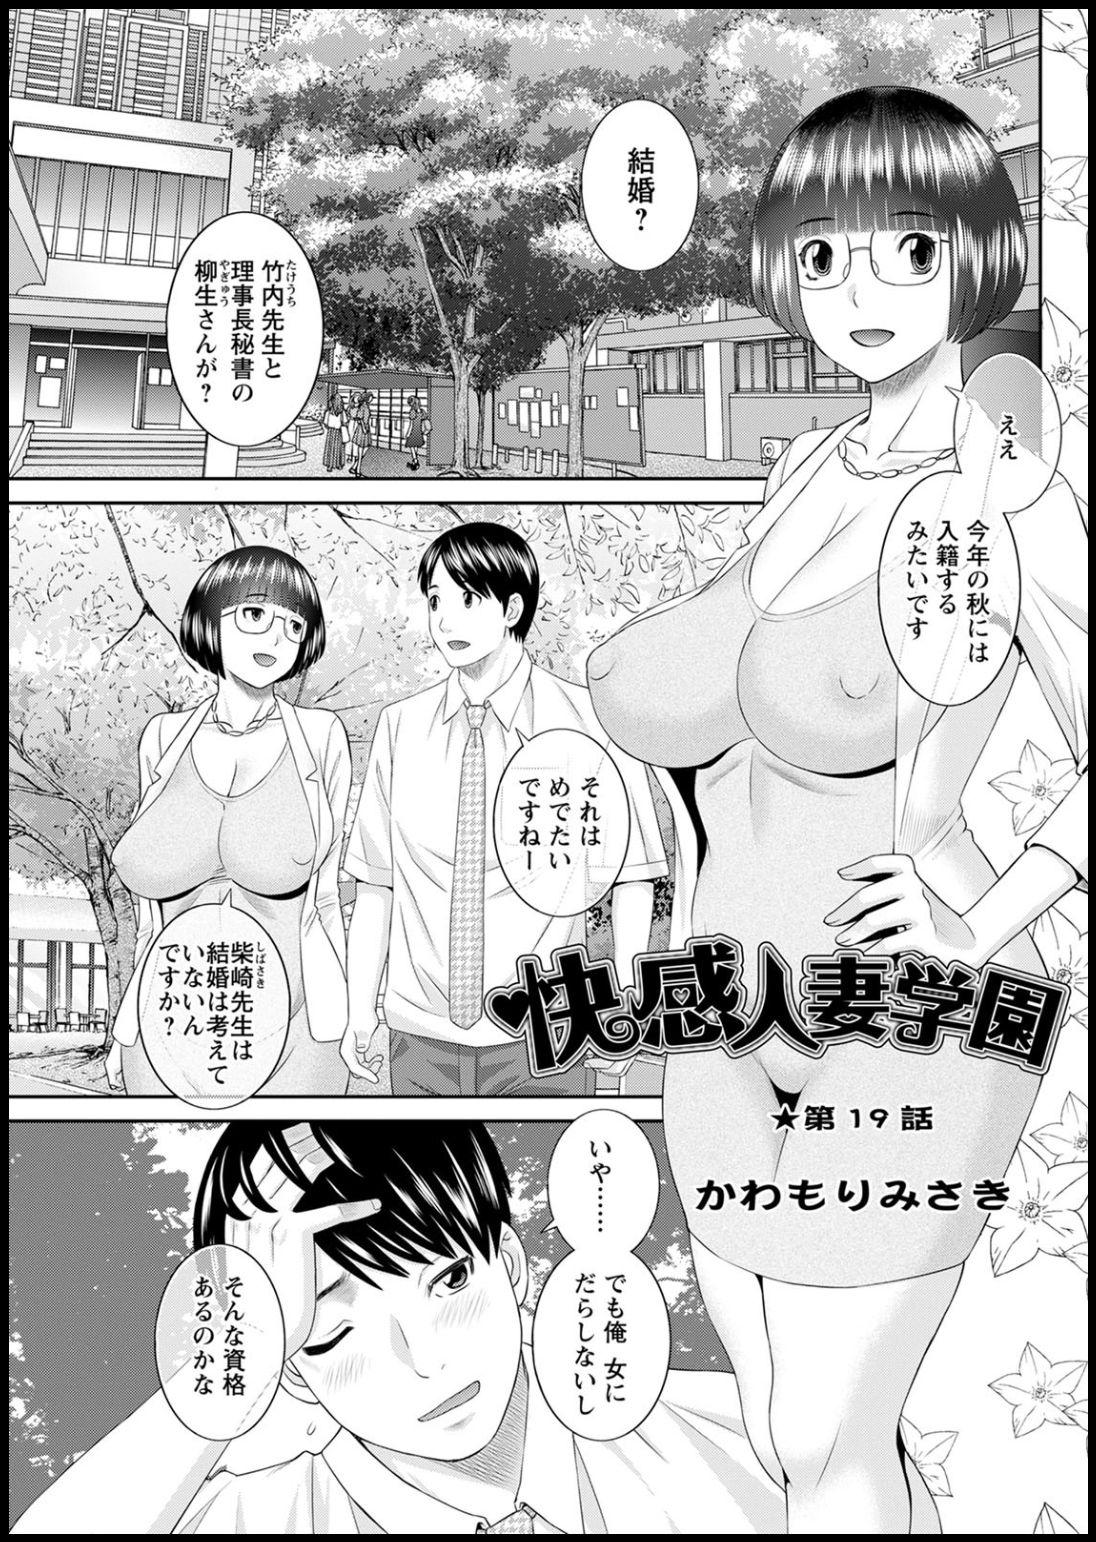 [Kawamori Misaki] Kaikan Hitotsuma Gakuen Ch. 1-6, 8-20 [Digital] 313